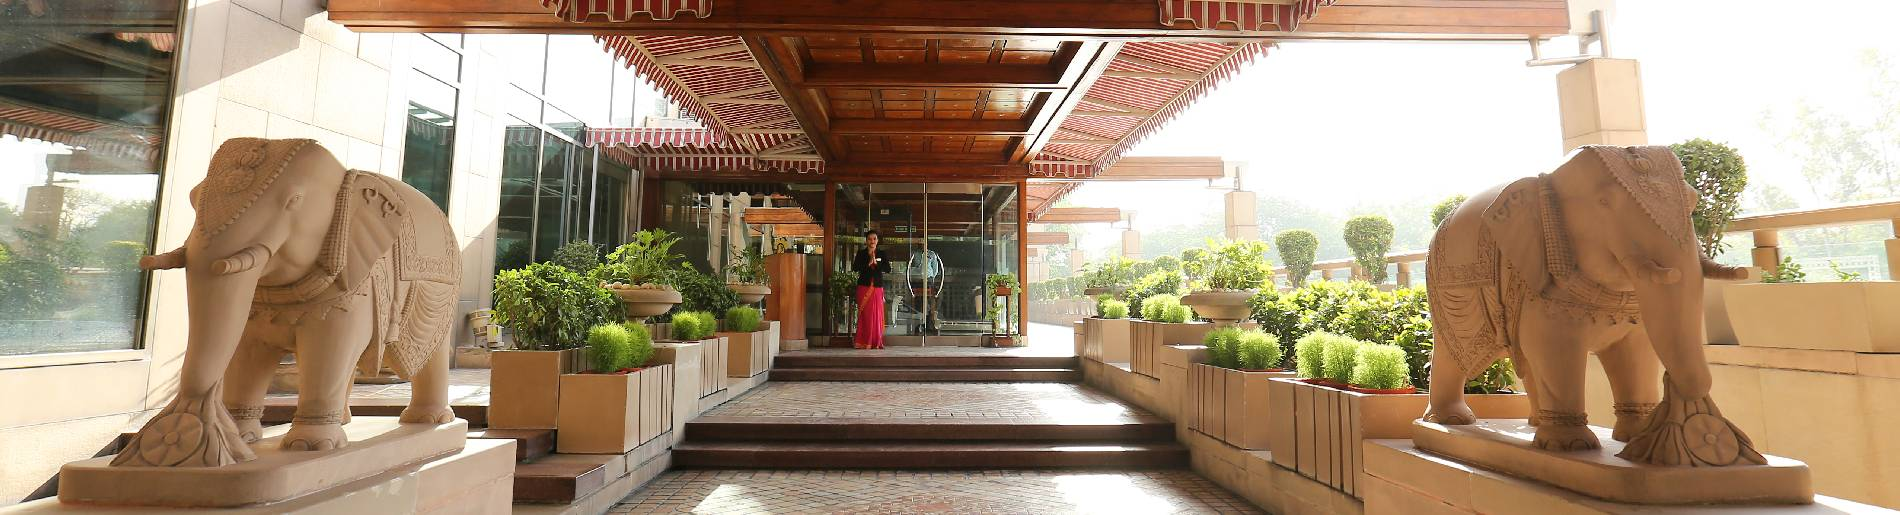 Business Meeting hotels near Delhi Airport